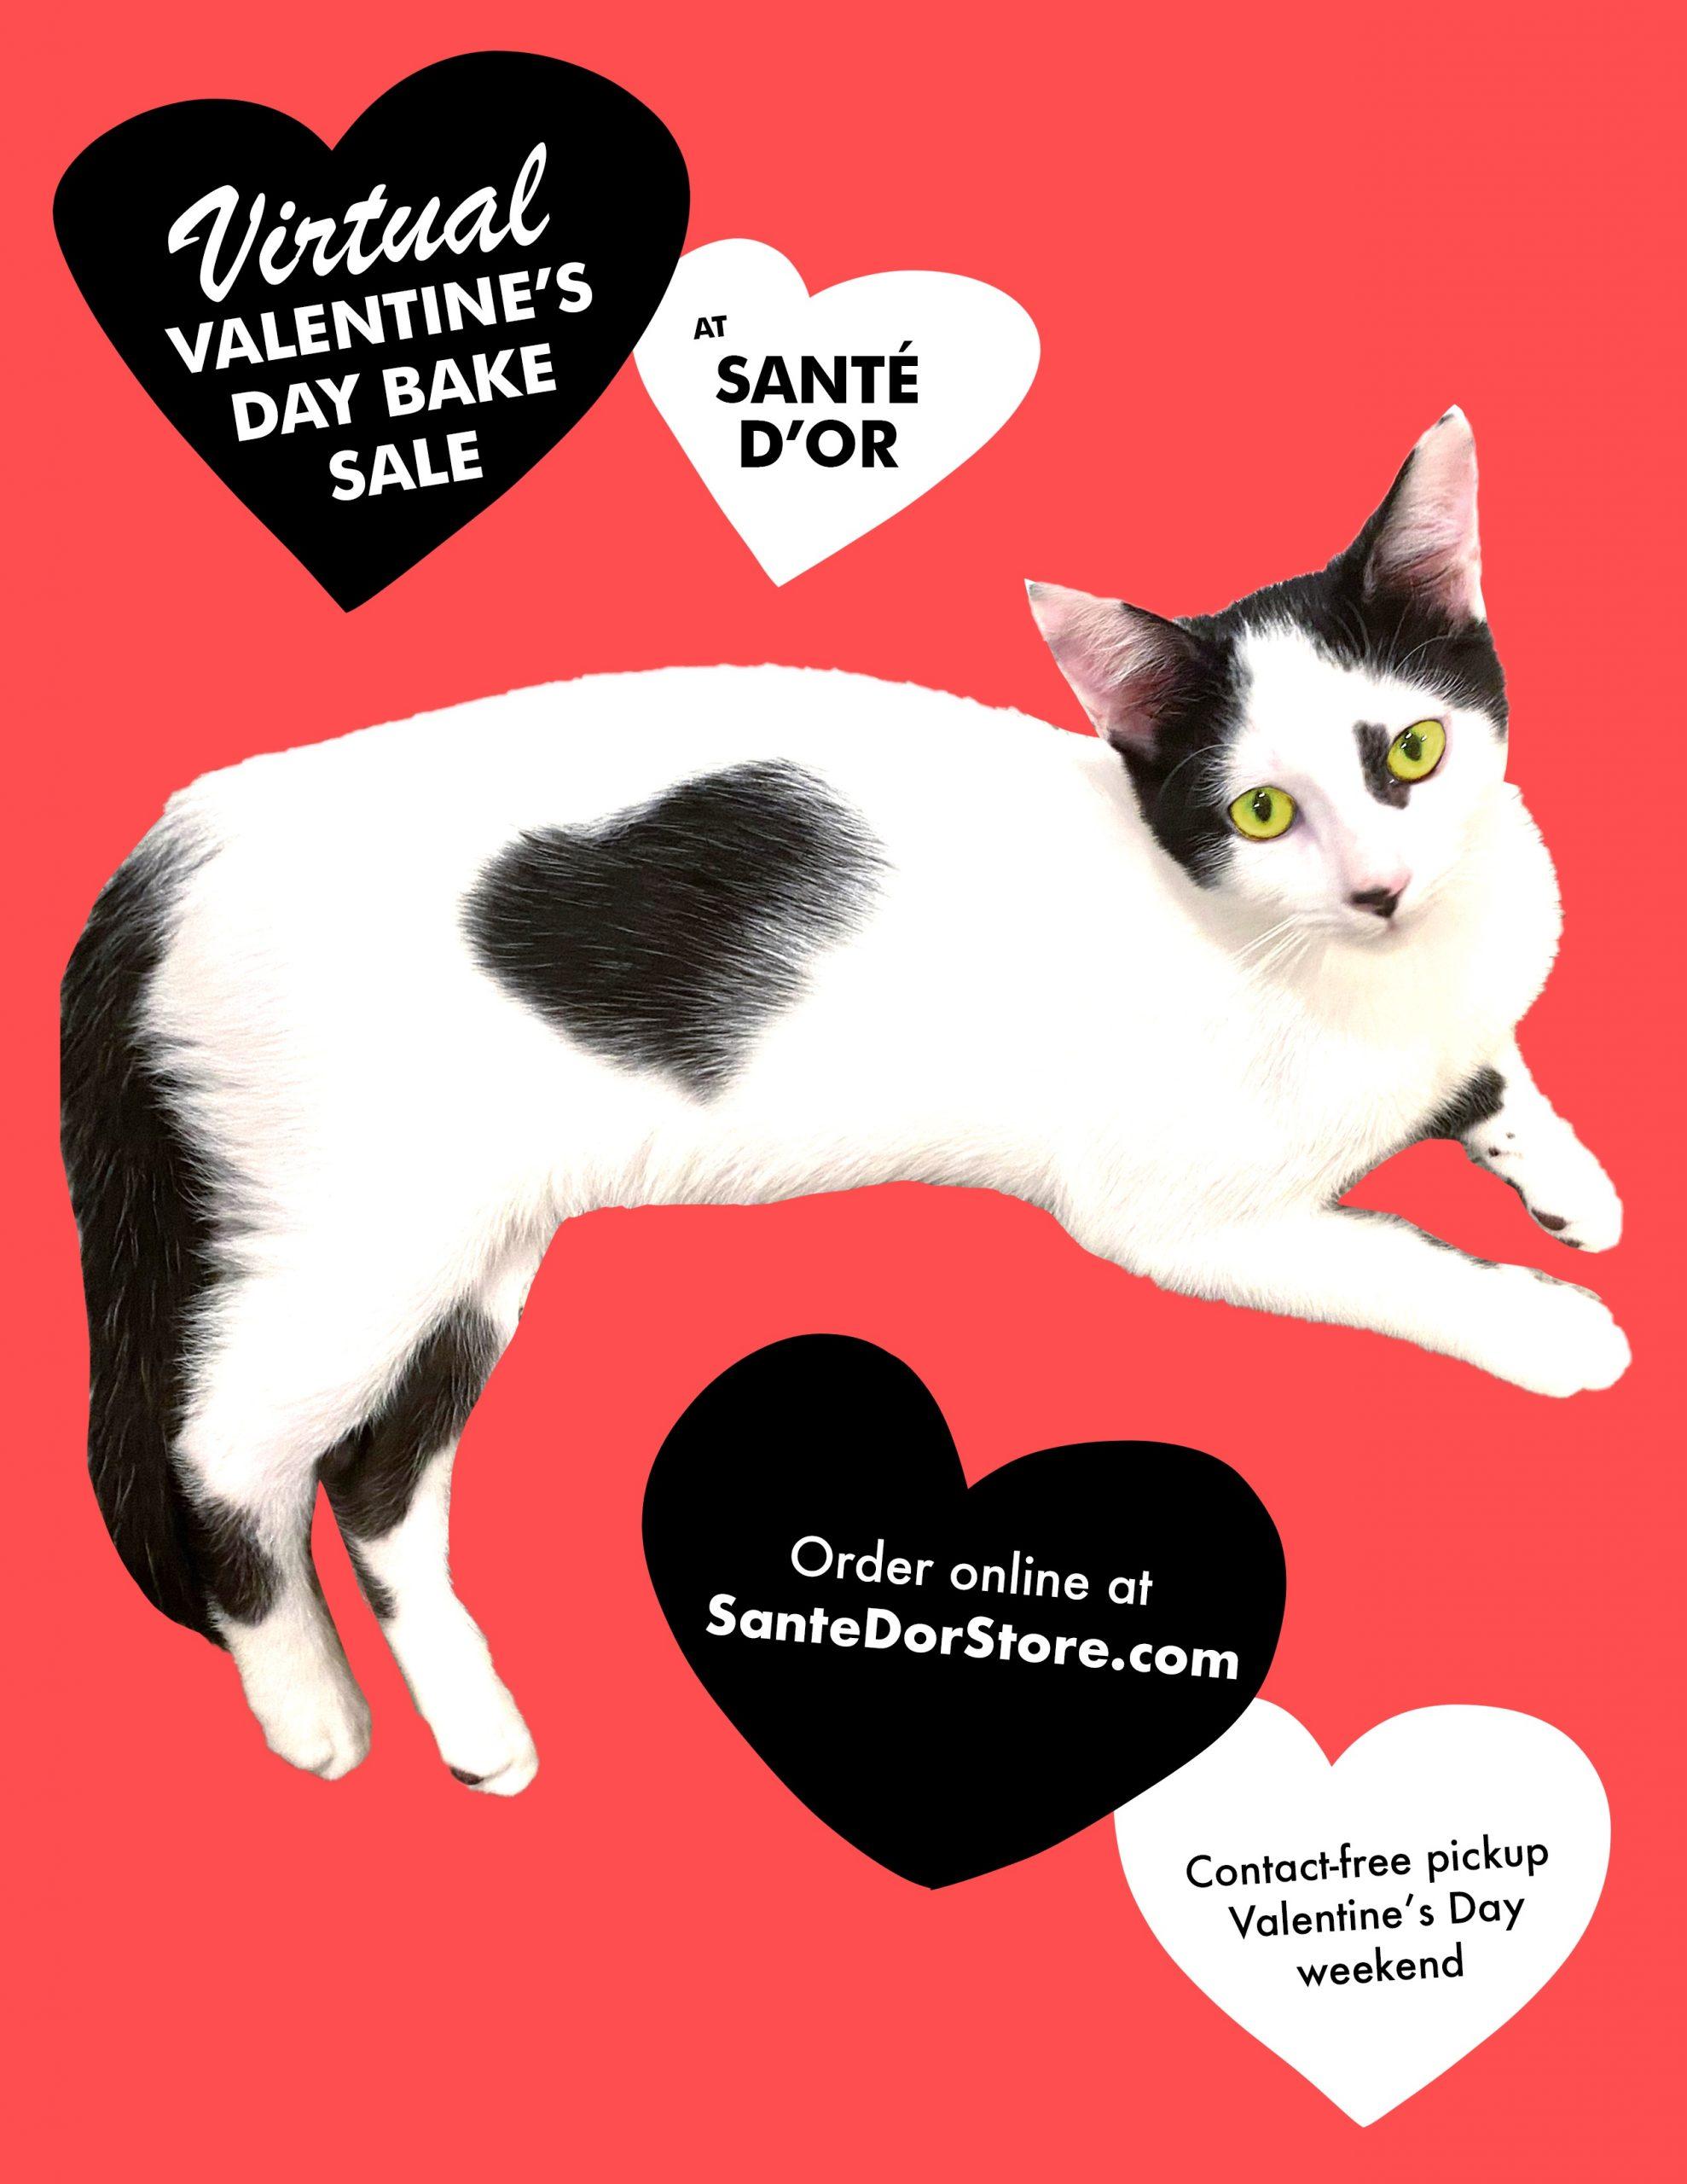 Virtual Valentine's Day Bake Sale